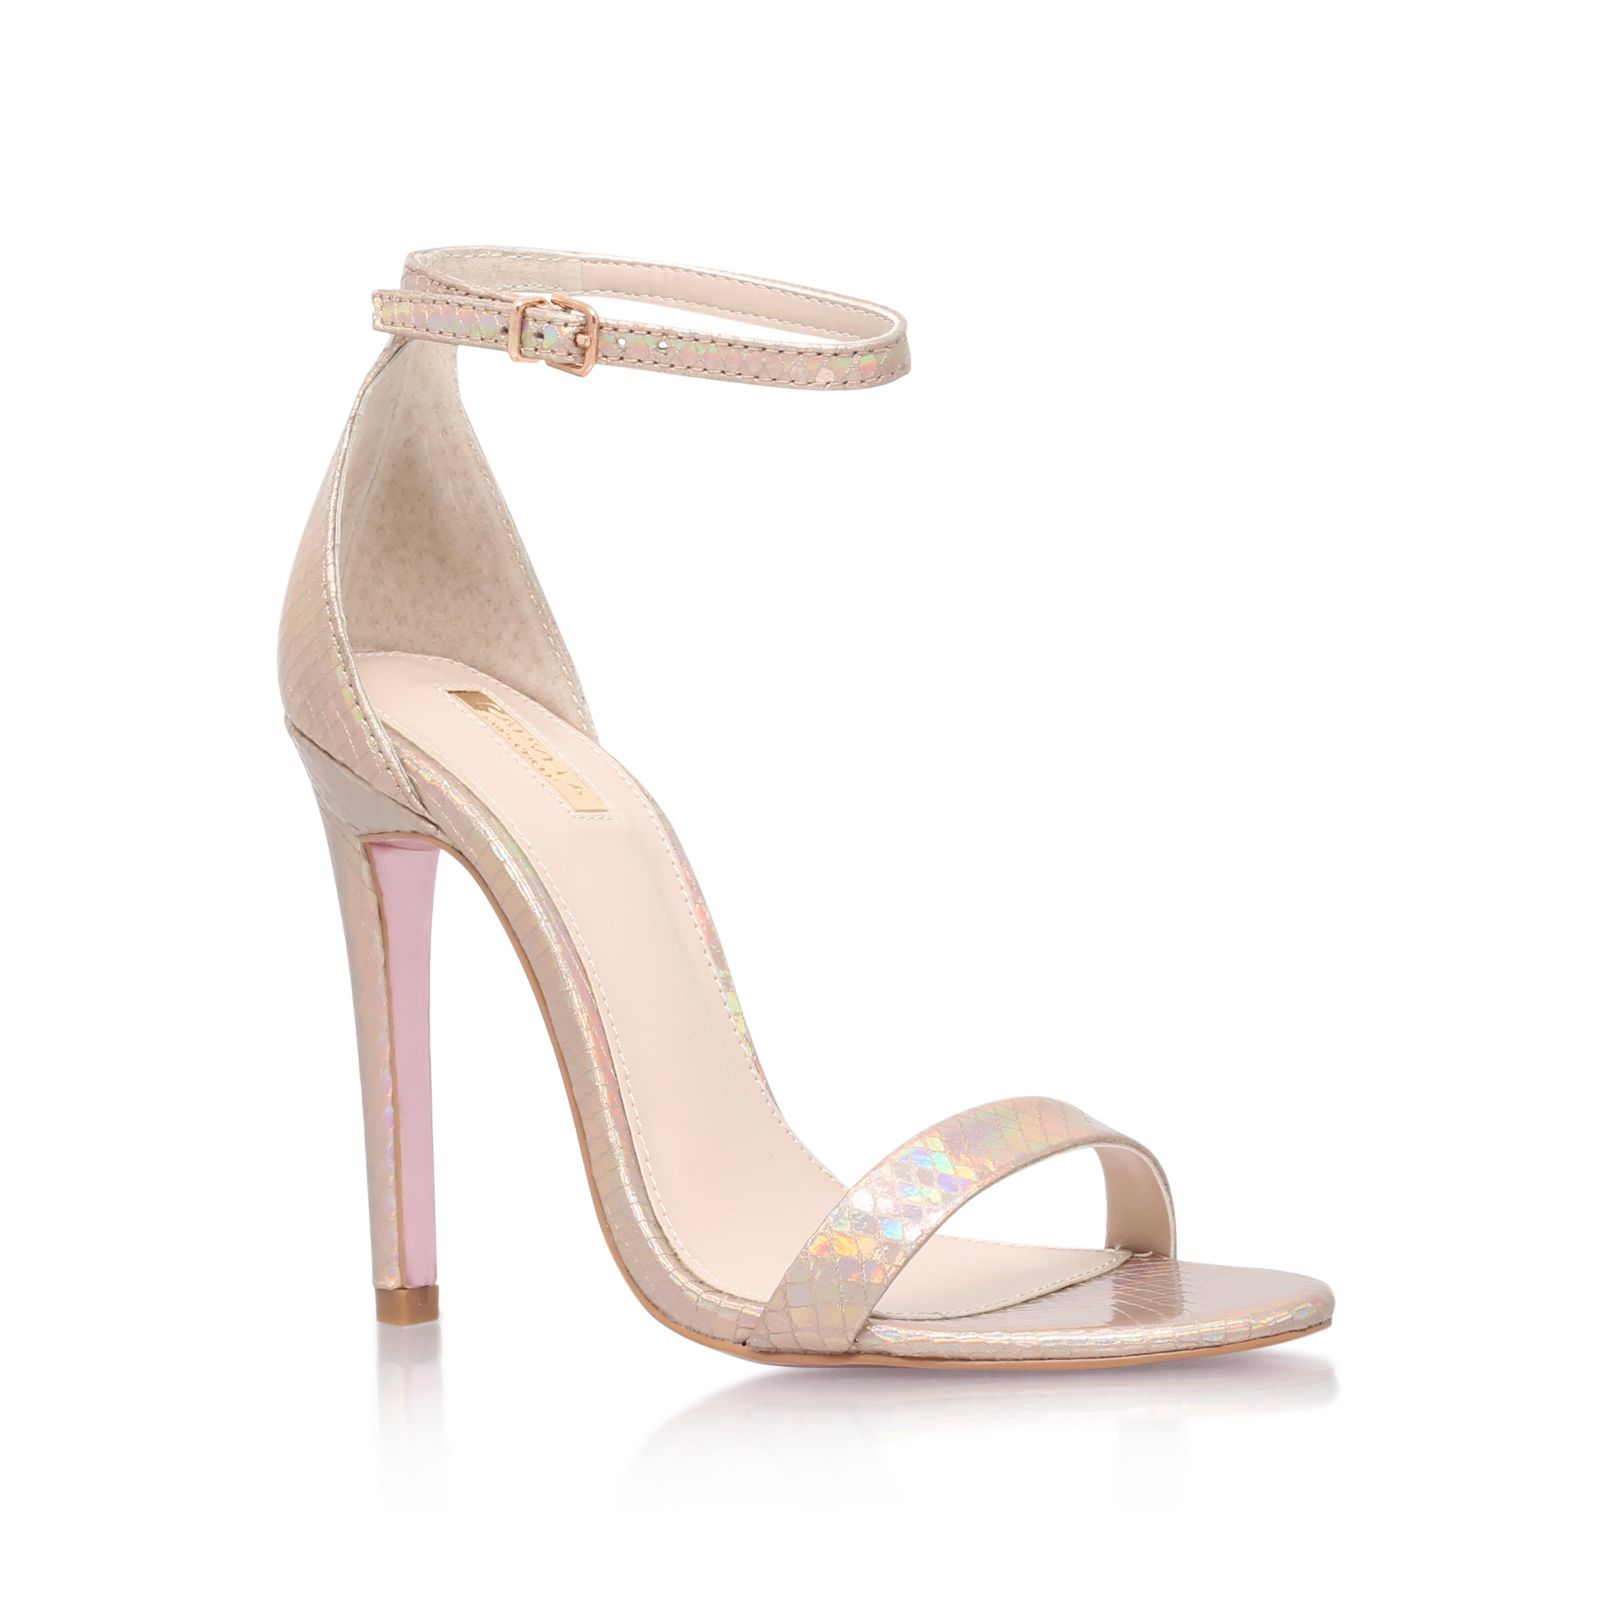 c93ed1a7482 Lyst - Carvela Kurt Geiger Gatsby High Heel Sandals in Metallic